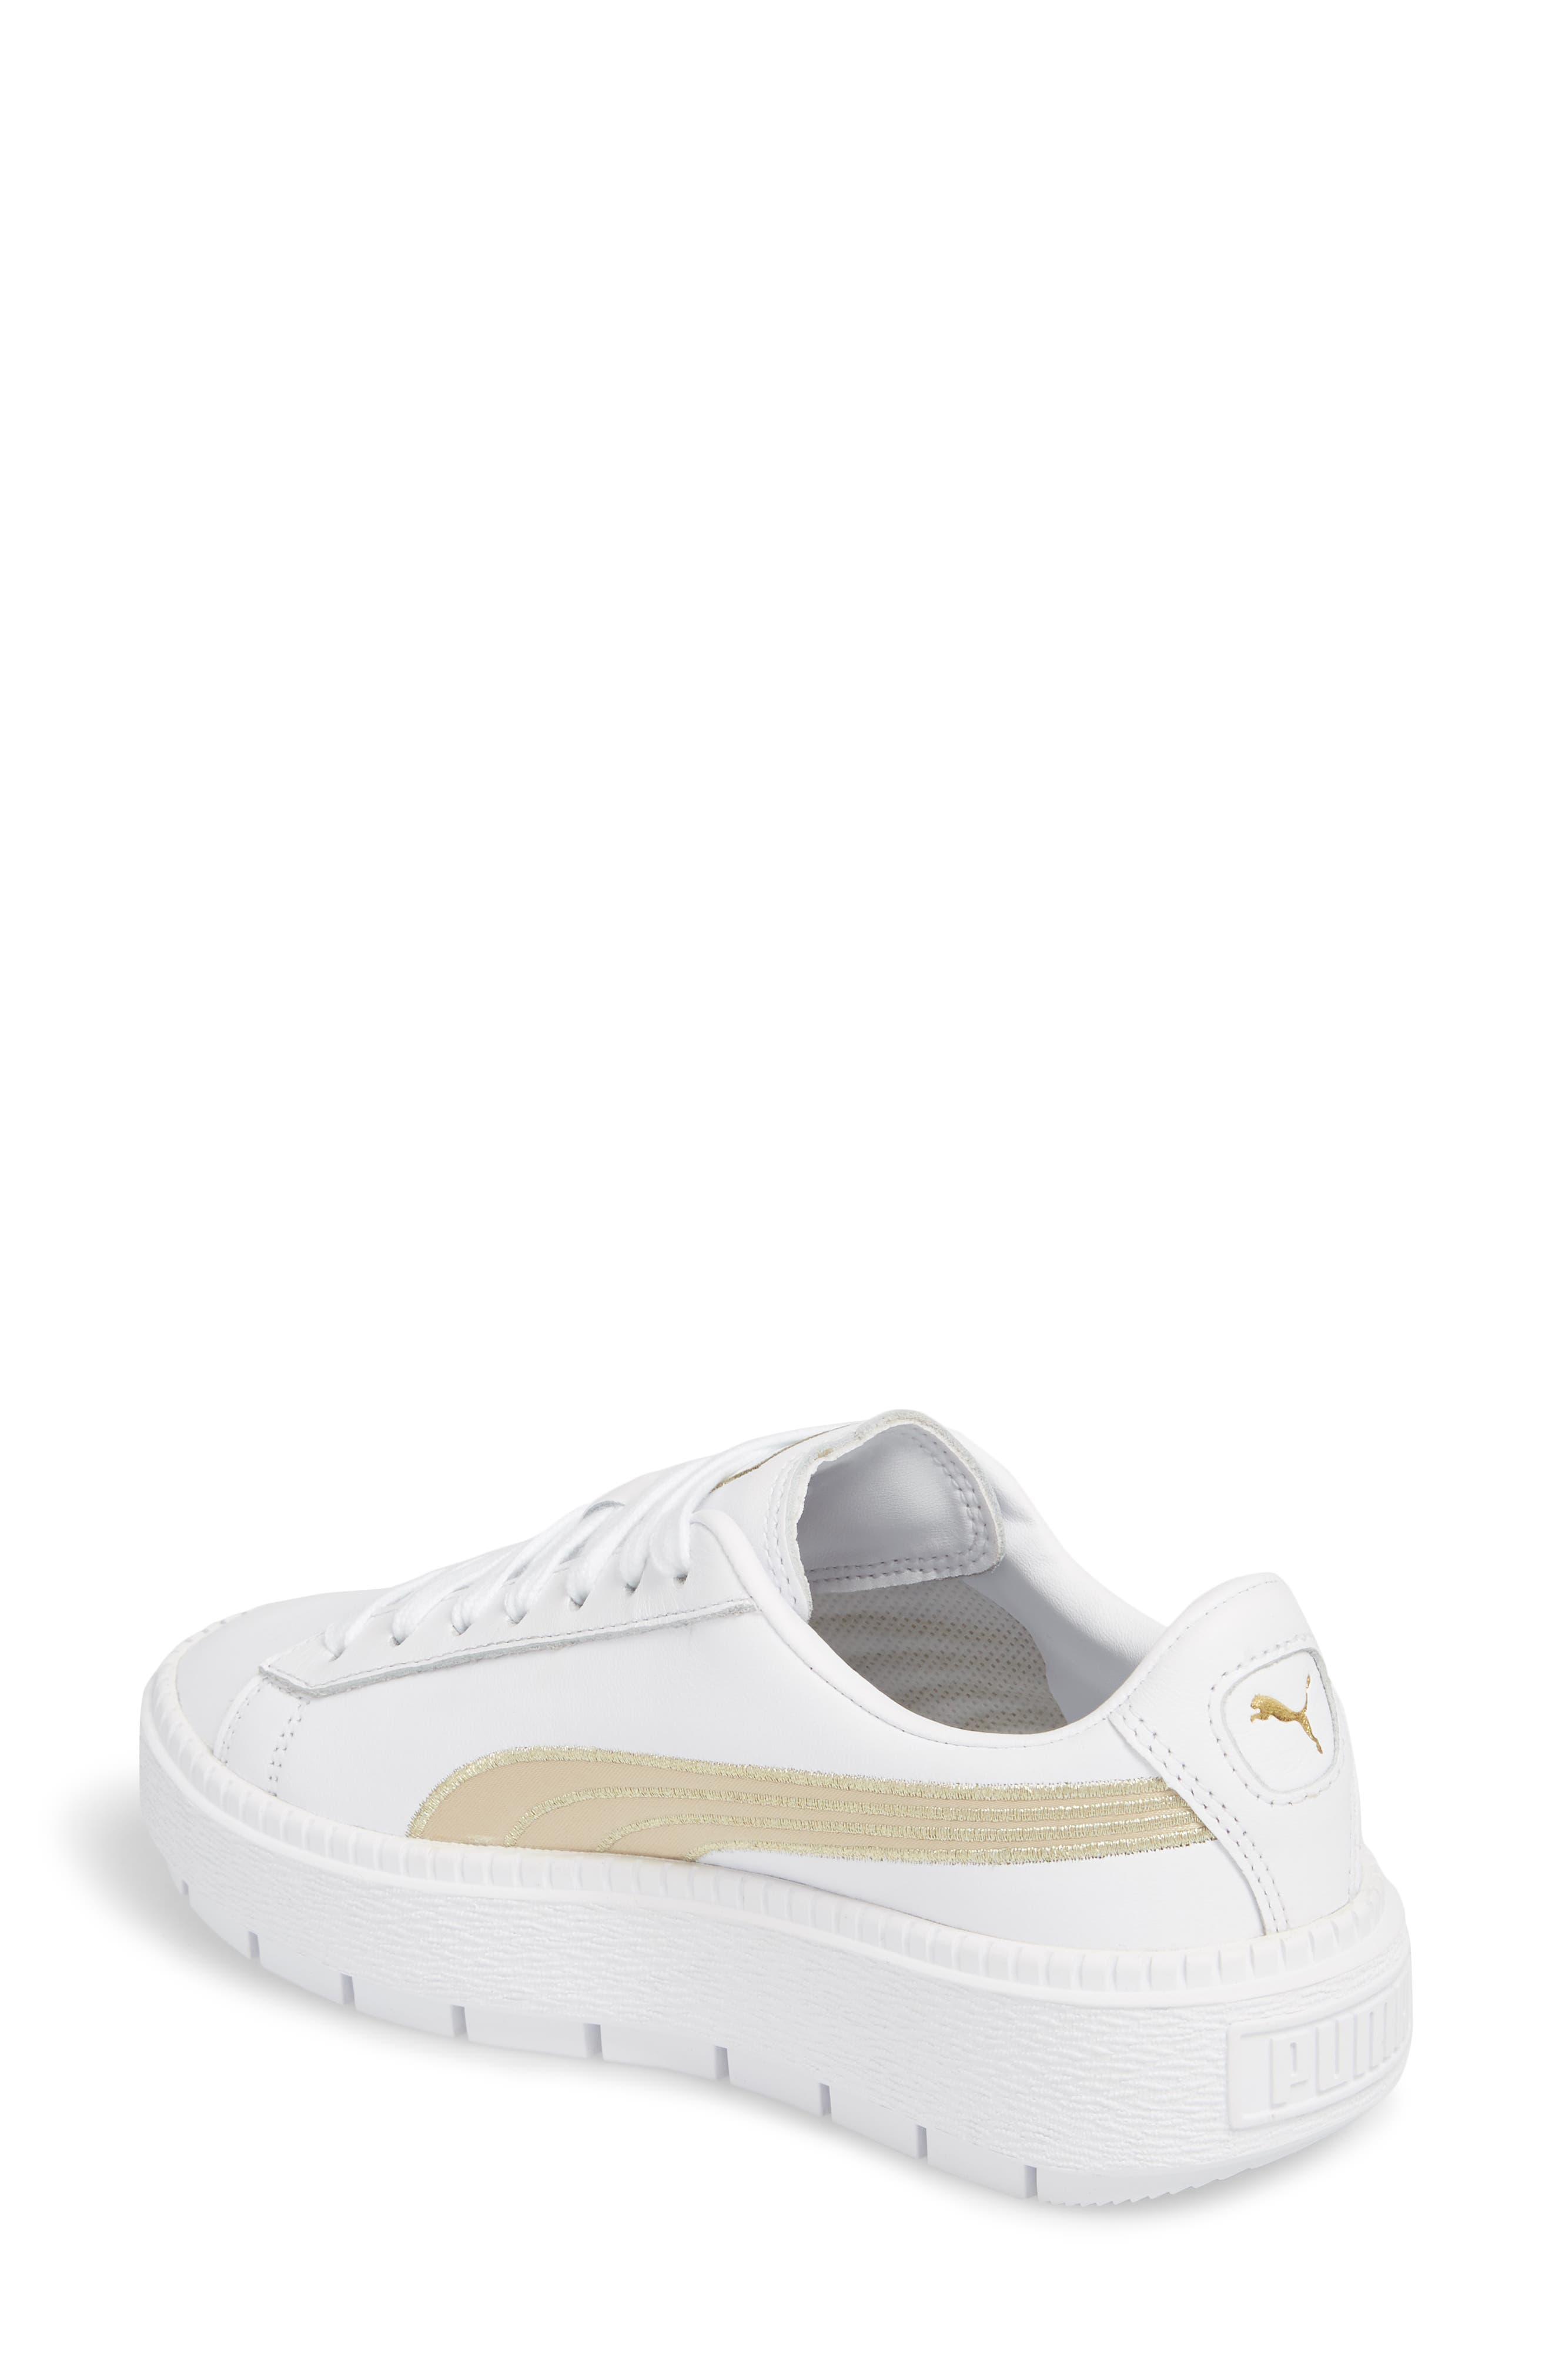 Platform Trace Sneaker,                             Alternate thumbnail 2, color,                             Puma White/ Metallic Gold